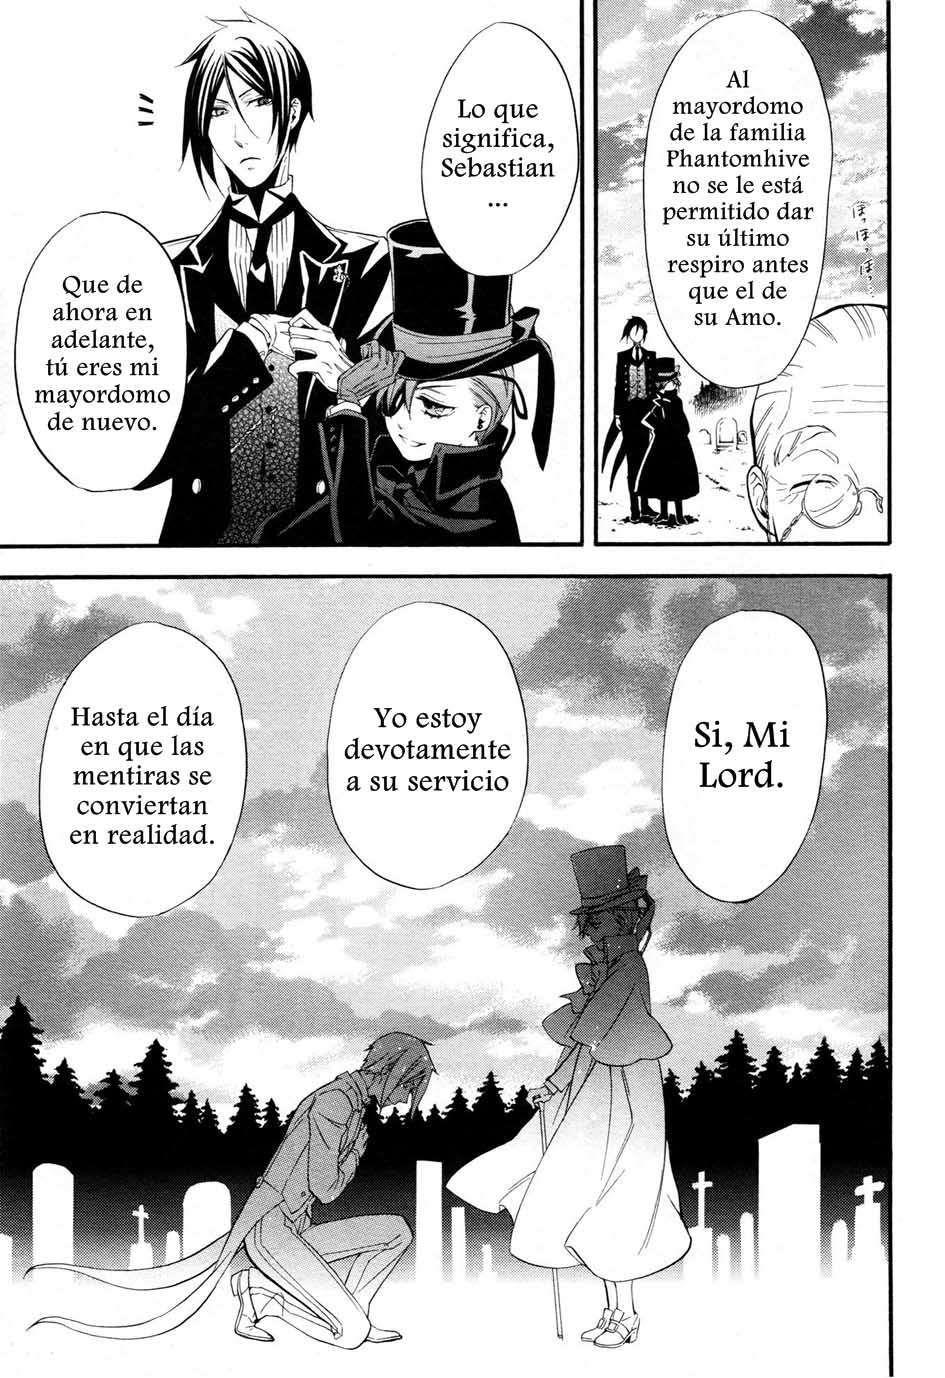 Kuroshitsuji - MANGA - Lector - TuMangaOnline